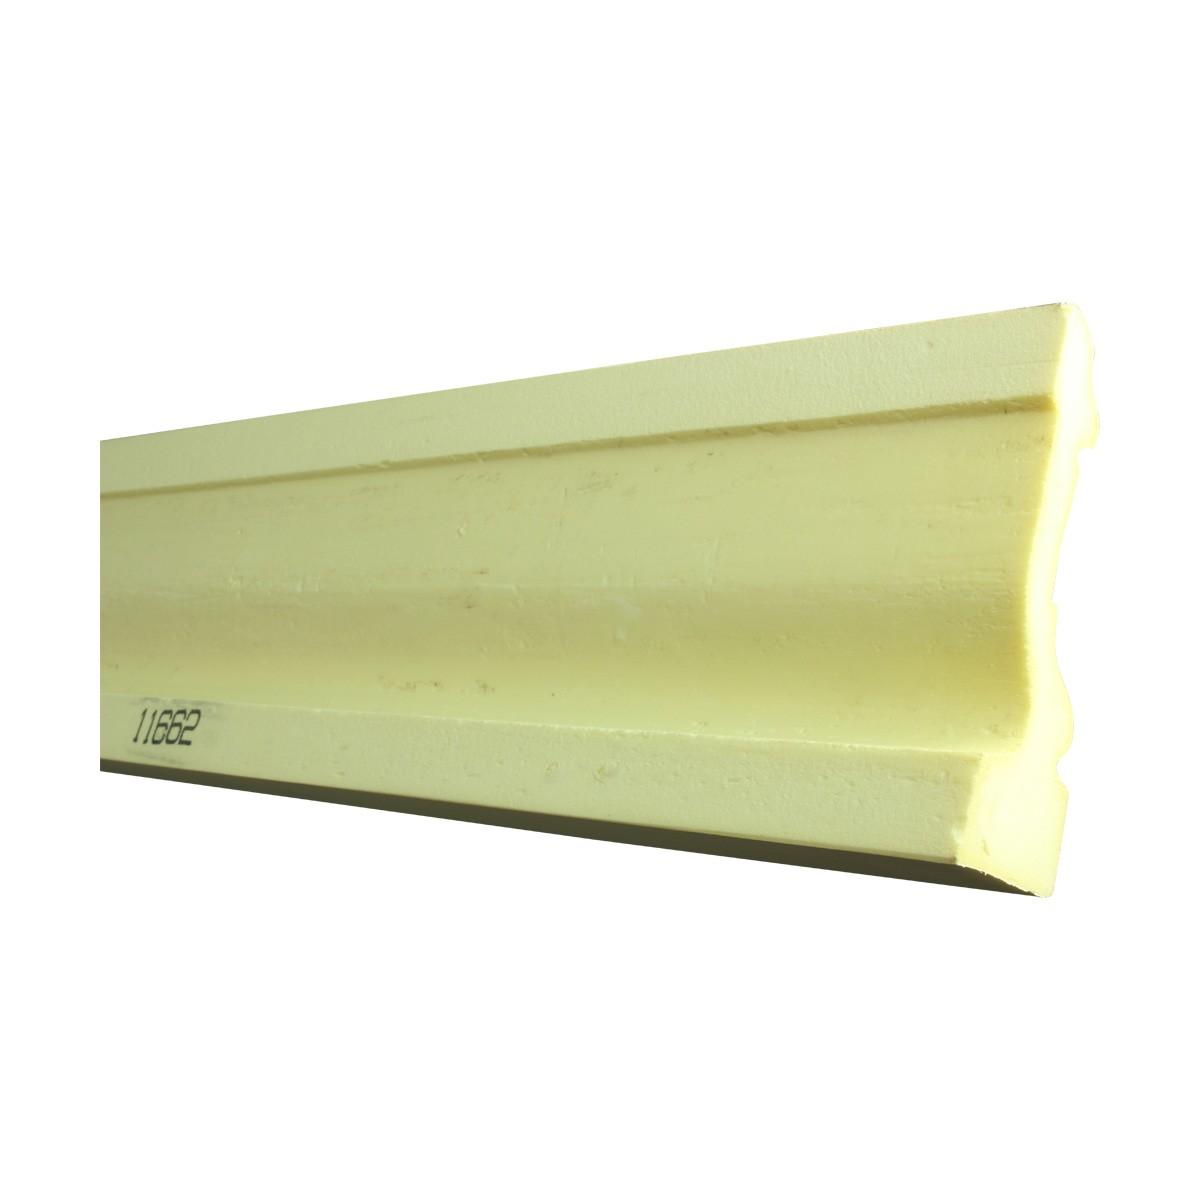 Cornice White Urethane Sample of 11662 23.5 Long Cornice Cornice Moulding Cornice Molding